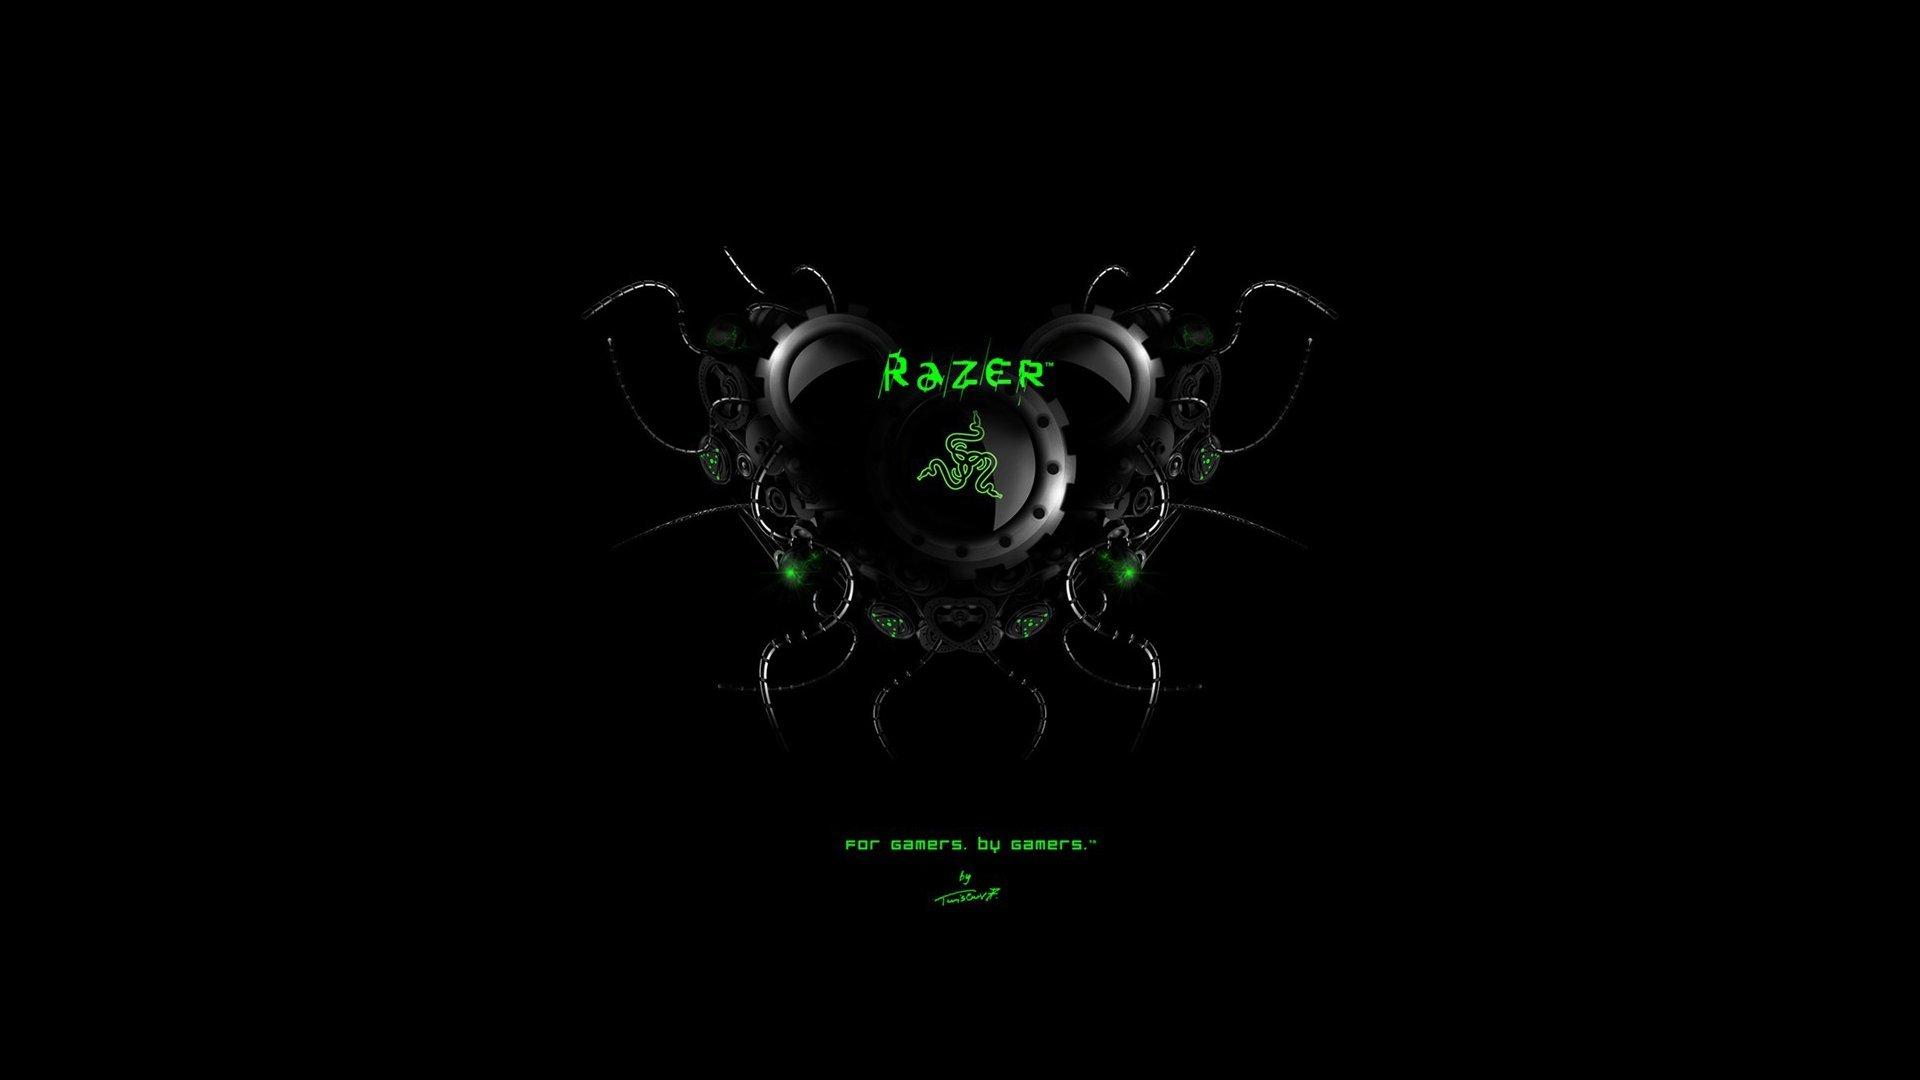 Download Full Hd Razer Desktop Wallpaper ID383602 For Free